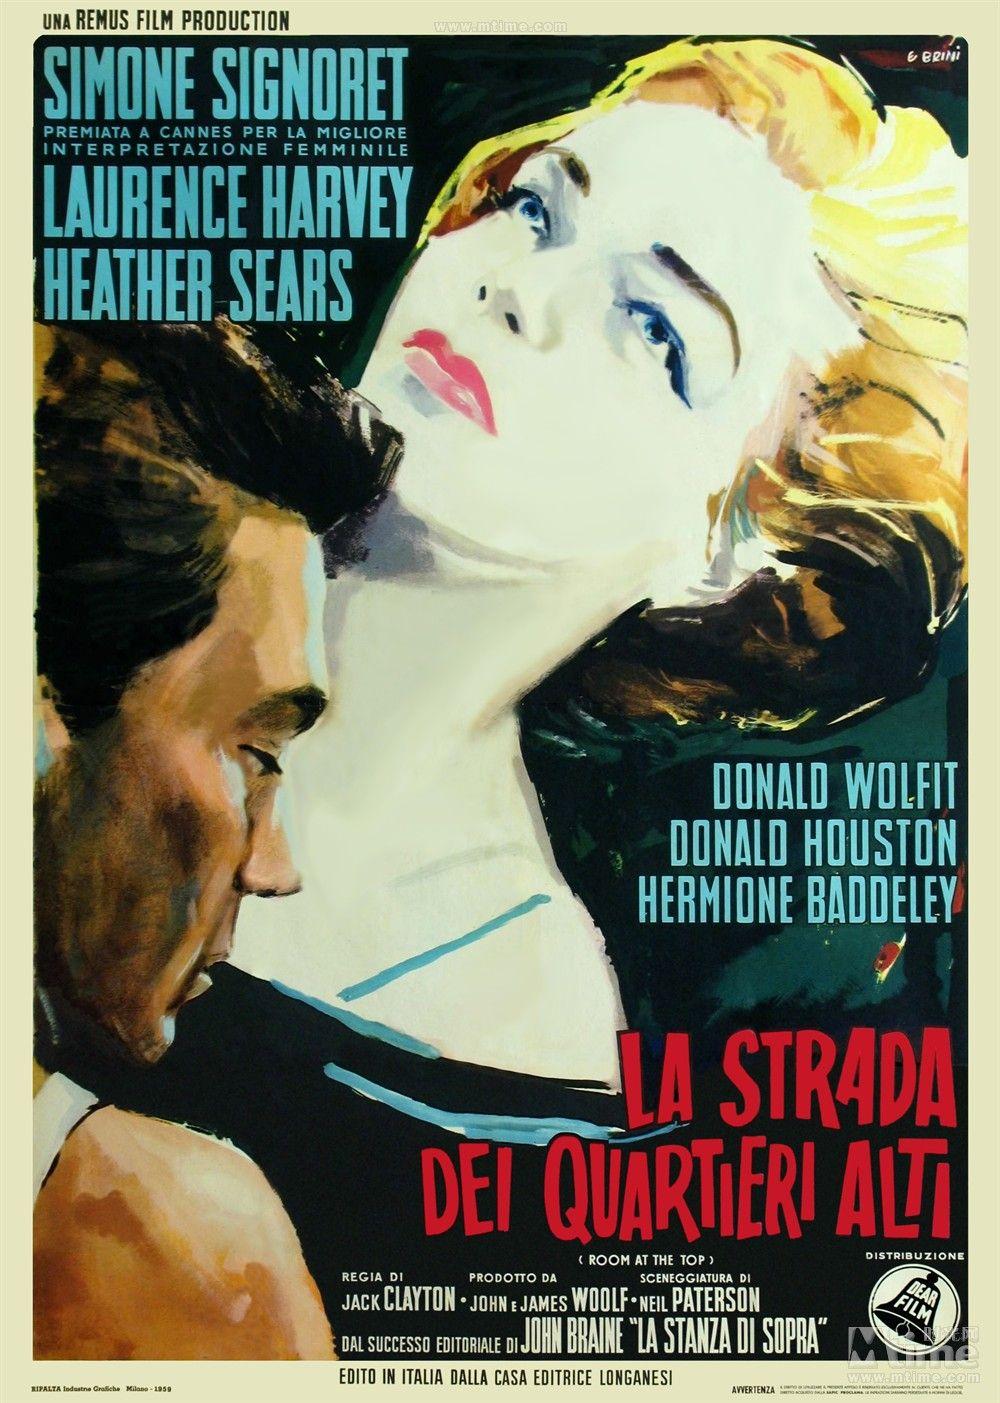 An Italian Poster For Jack Clayton S 1959 Drama Room At The Top Source Listal Com Carteles De Cine Carteles De Peliculas Cartel